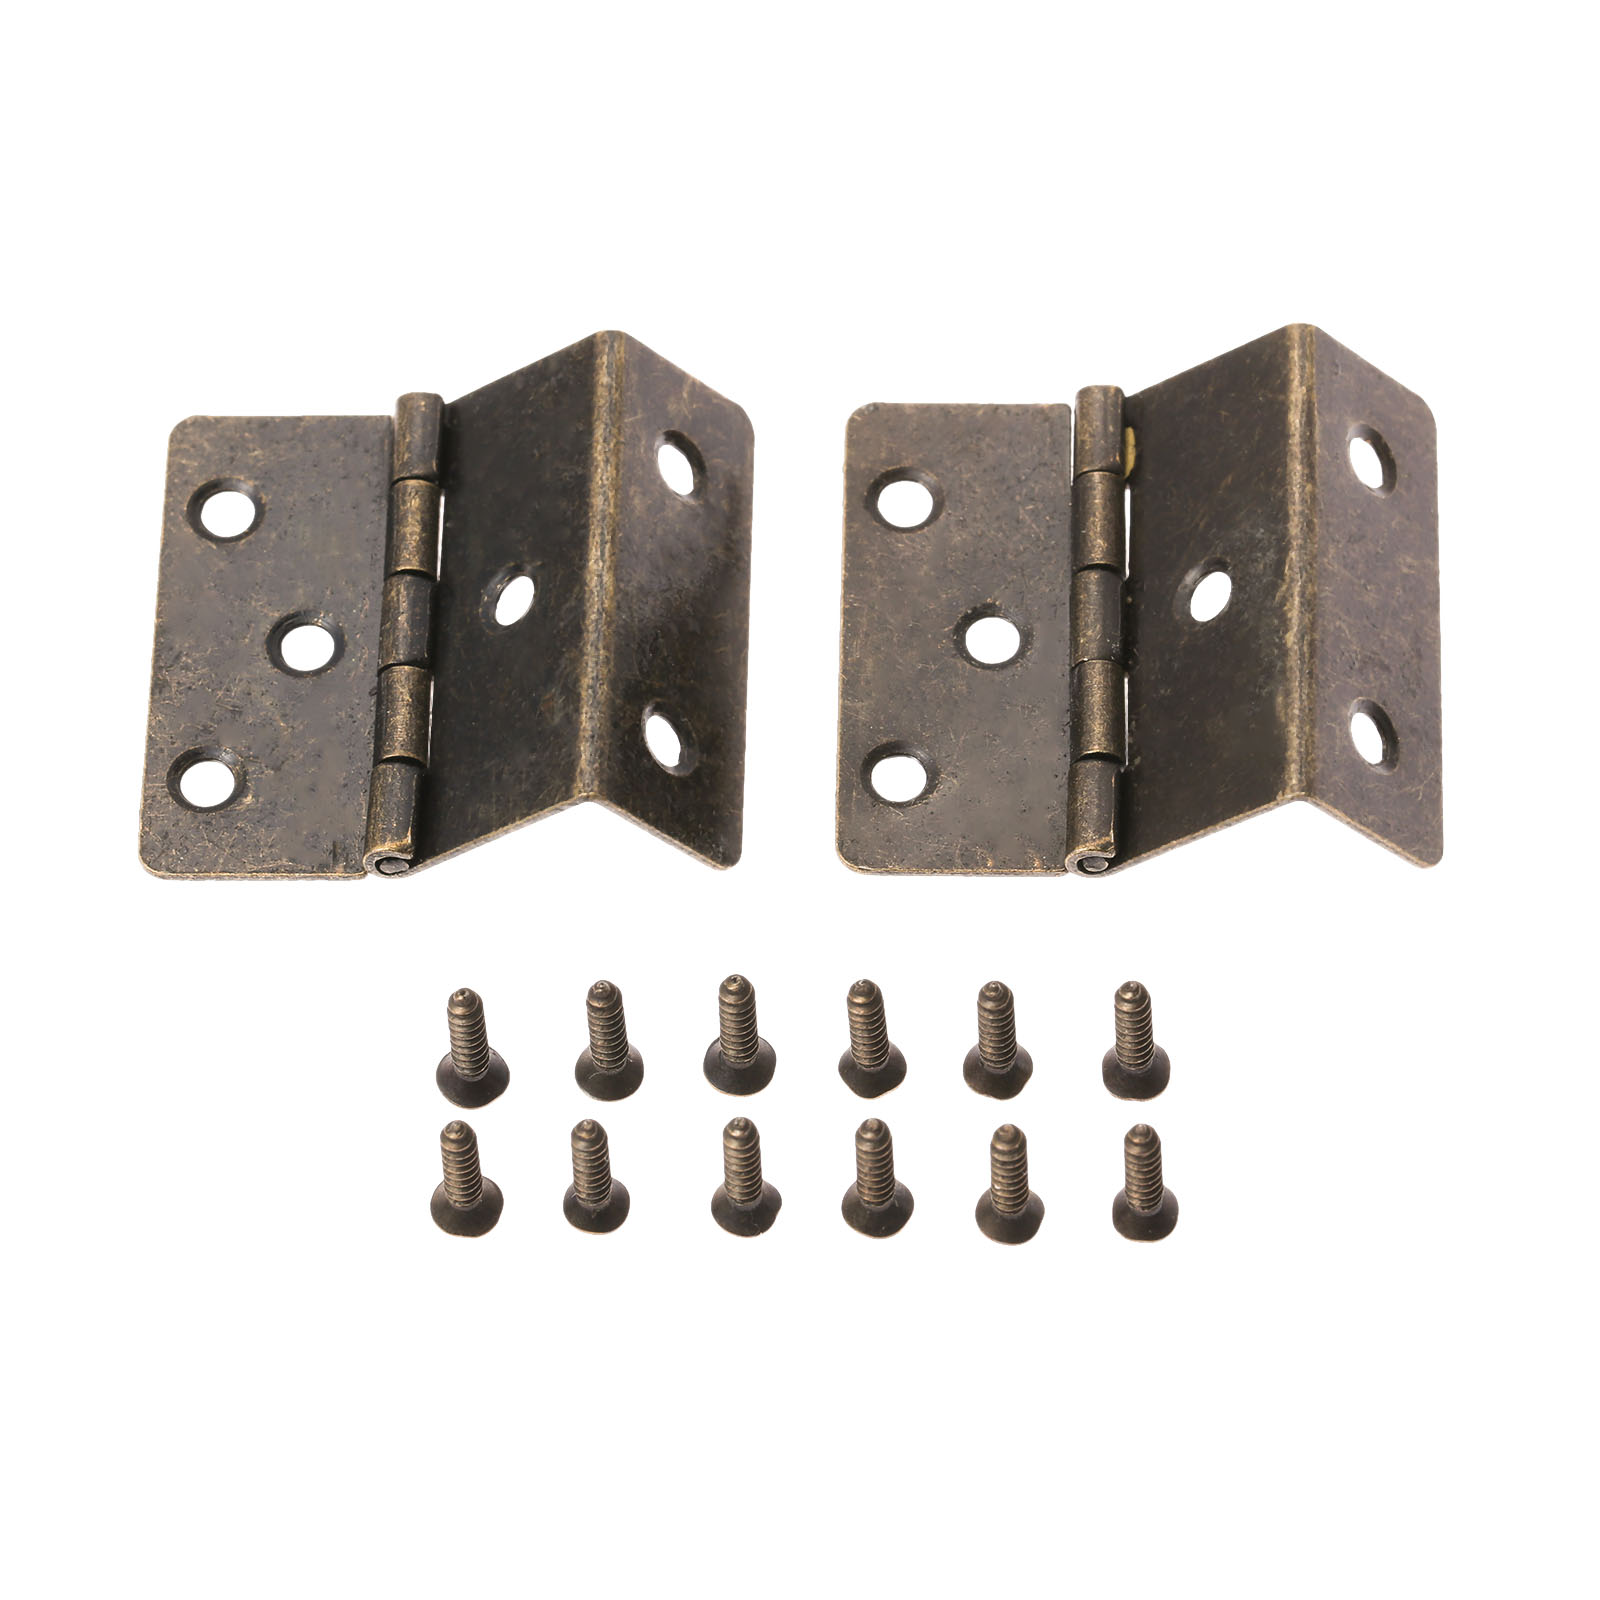 DRELD 2Pcs 44*45*22mm Triple Fold Door Hinges Furniture Hardware for Cabinet Trunk Jewelry Box Storage Box Furniture Fittings